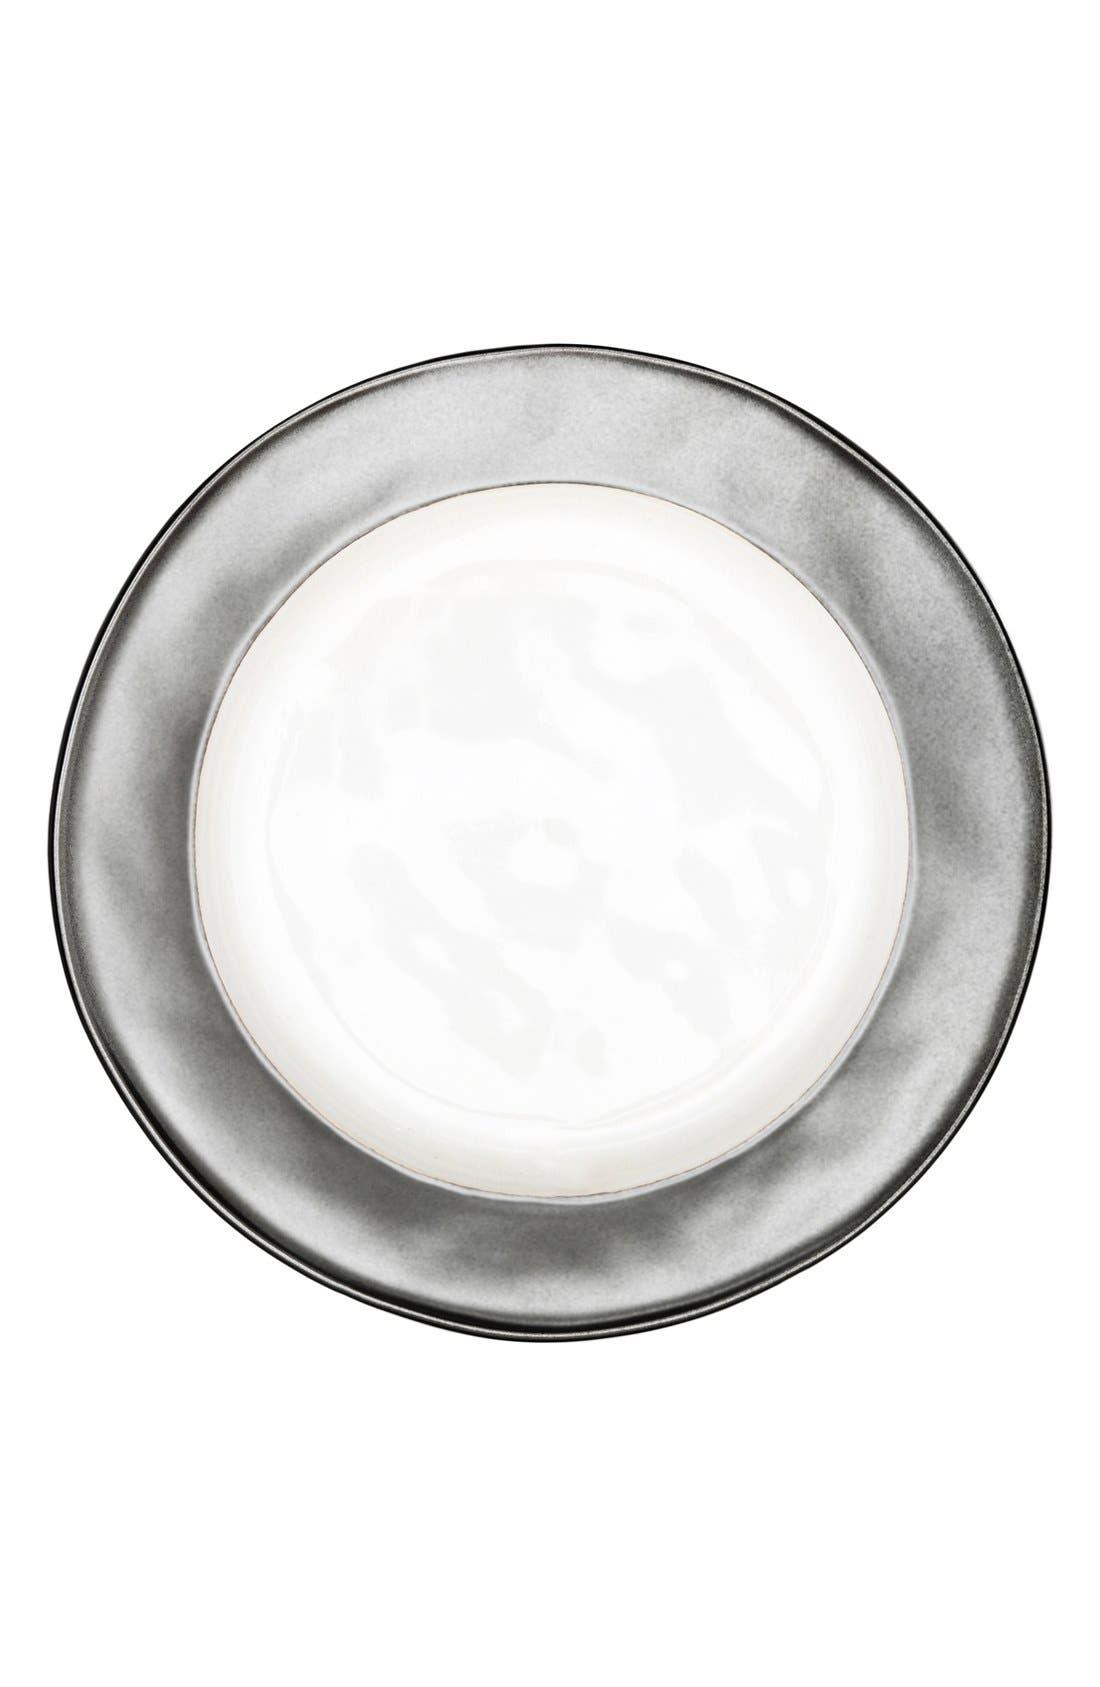 Main Image - Juliska'Emerson' Ceramic Dessert Plate